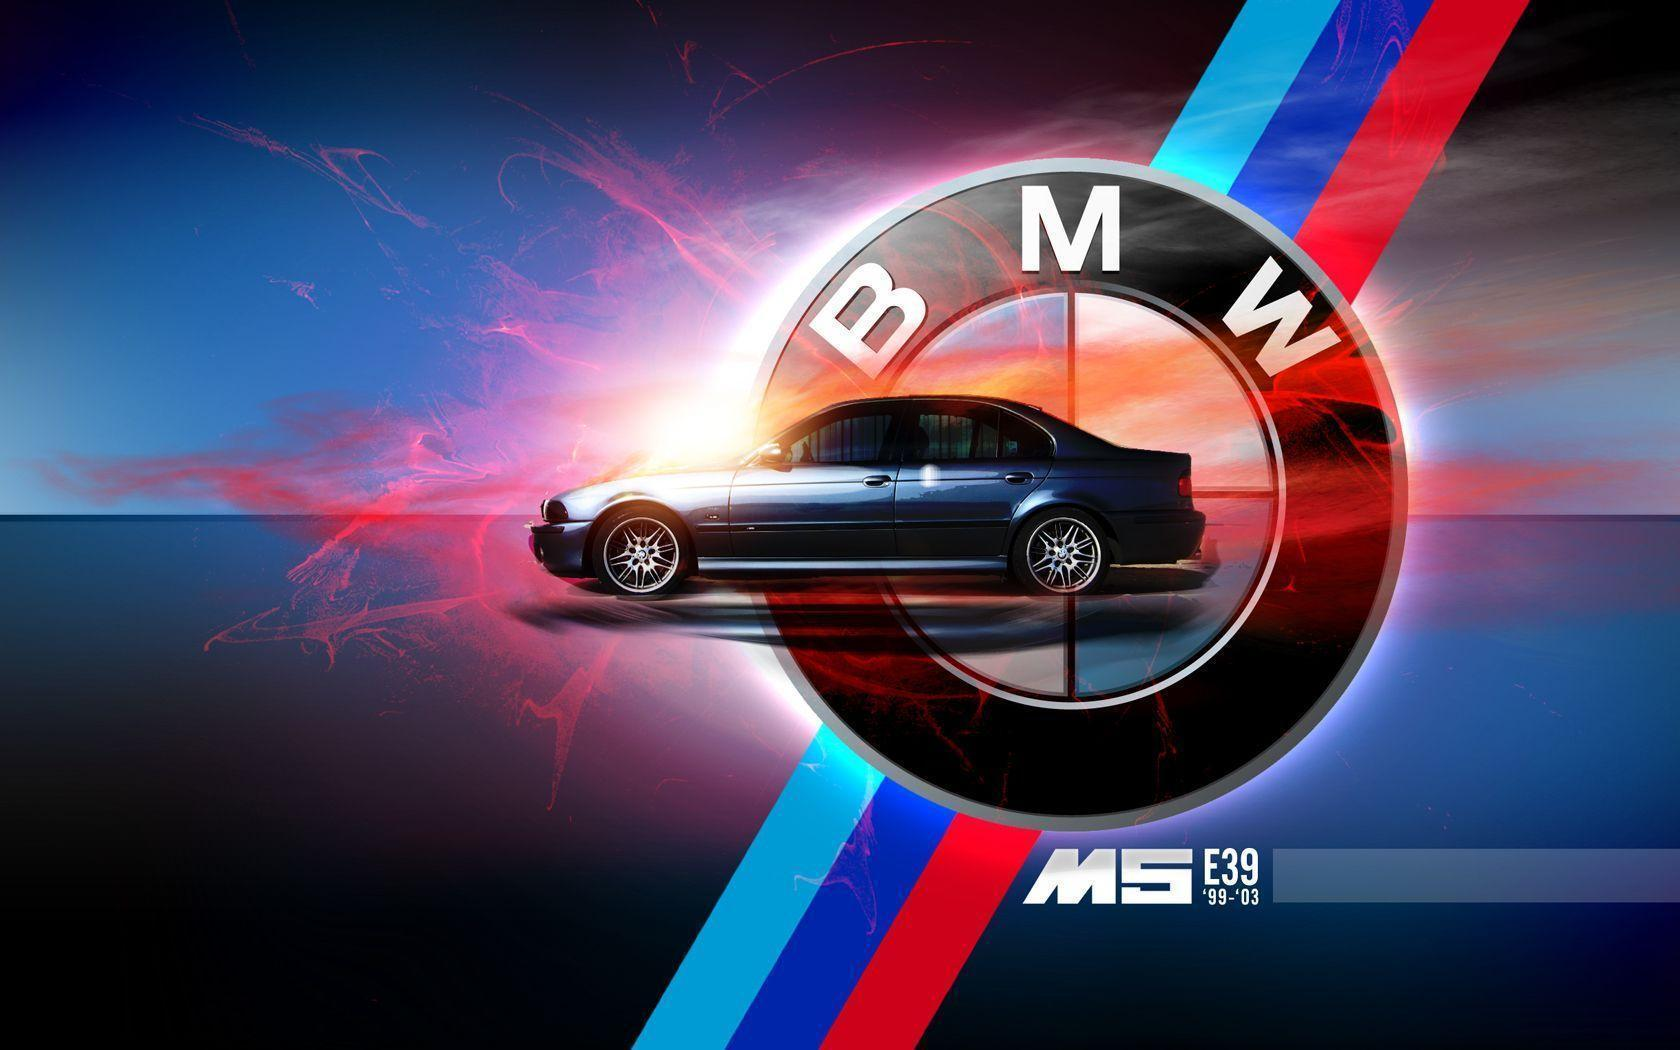 Download Bmw M Logo Wallpaper Hd Backgrounds Download Itlcat